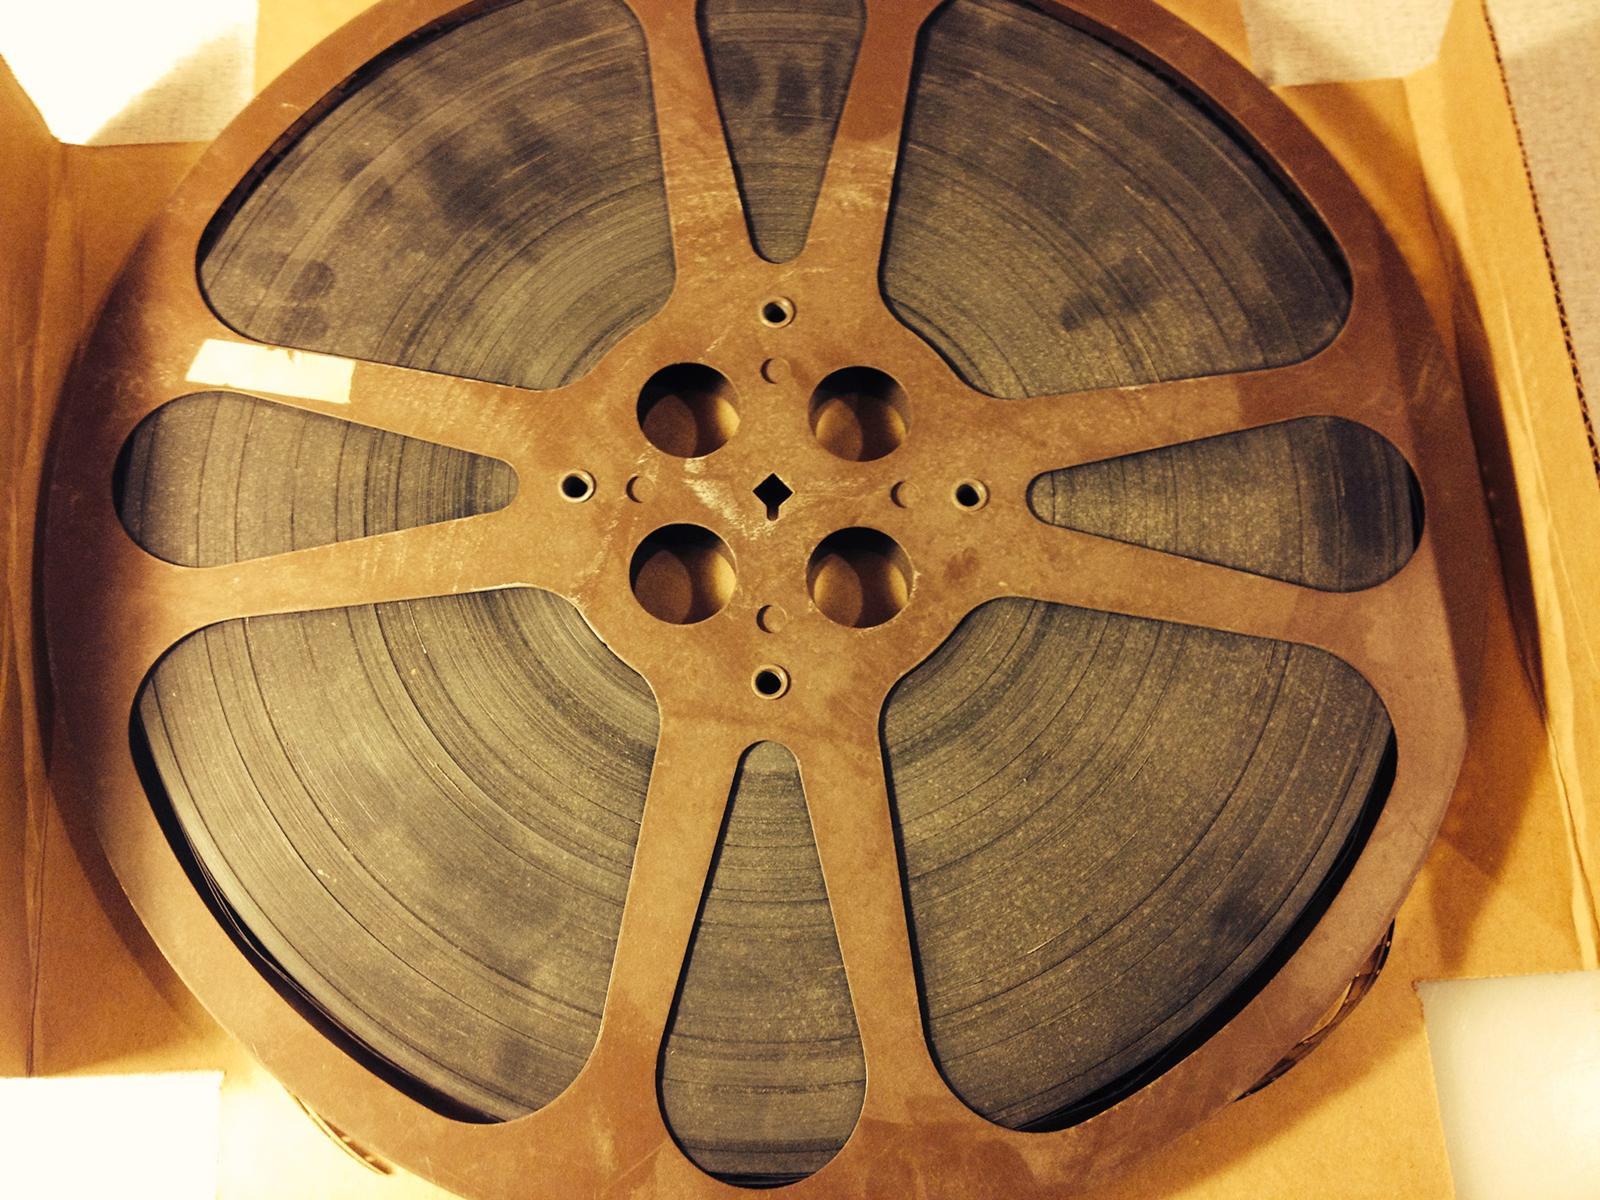 A rusty 16mm metal reel full of film sits in an open cardboard box.